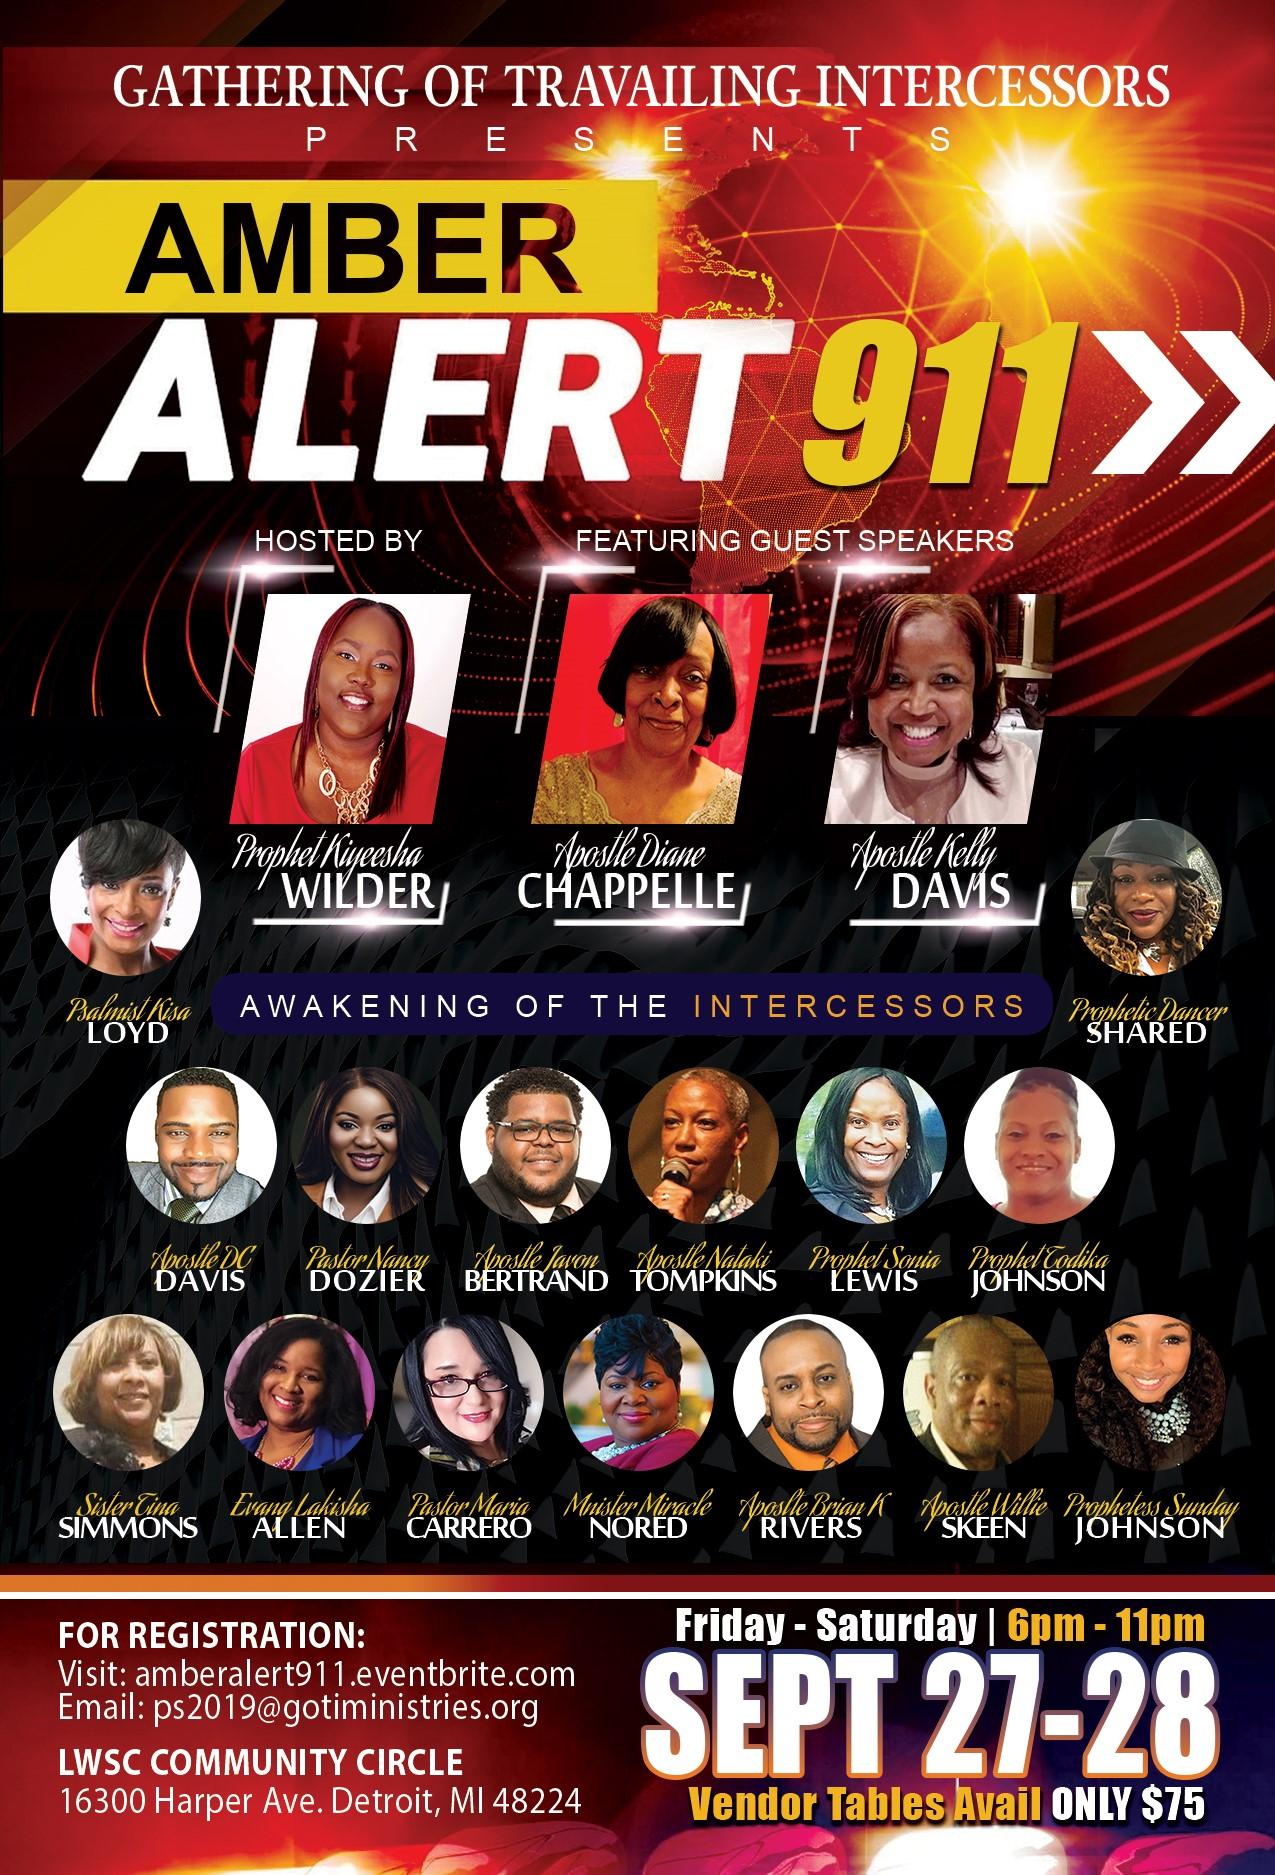 Amber Alert 911